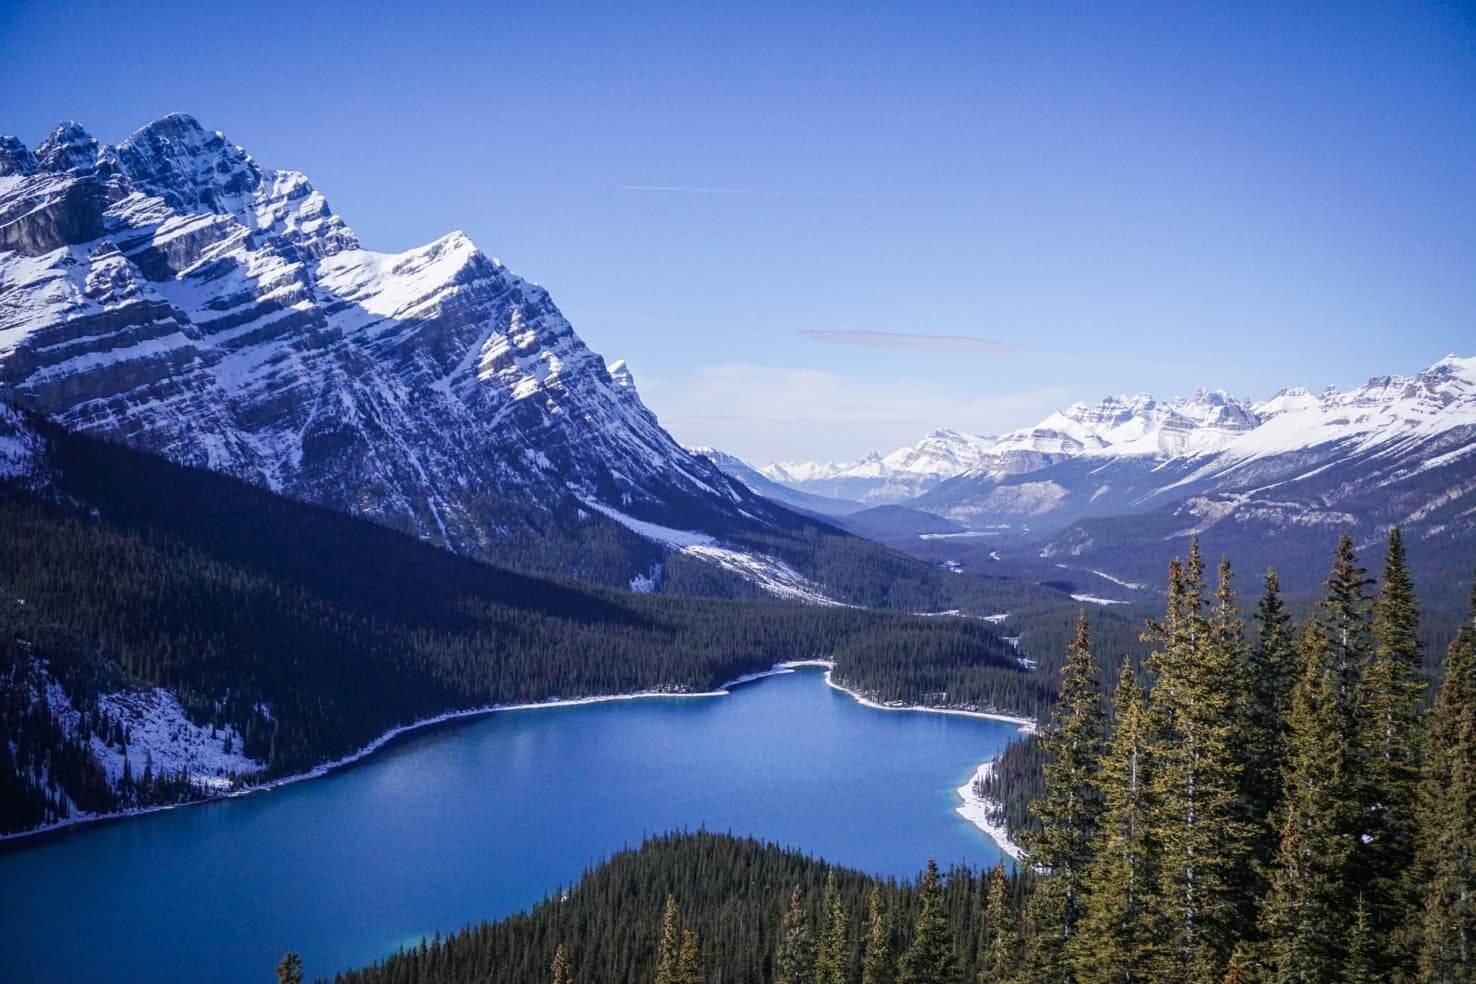 Canadian Rockies road trip itinerary - Peyto Lake in Banff National Park